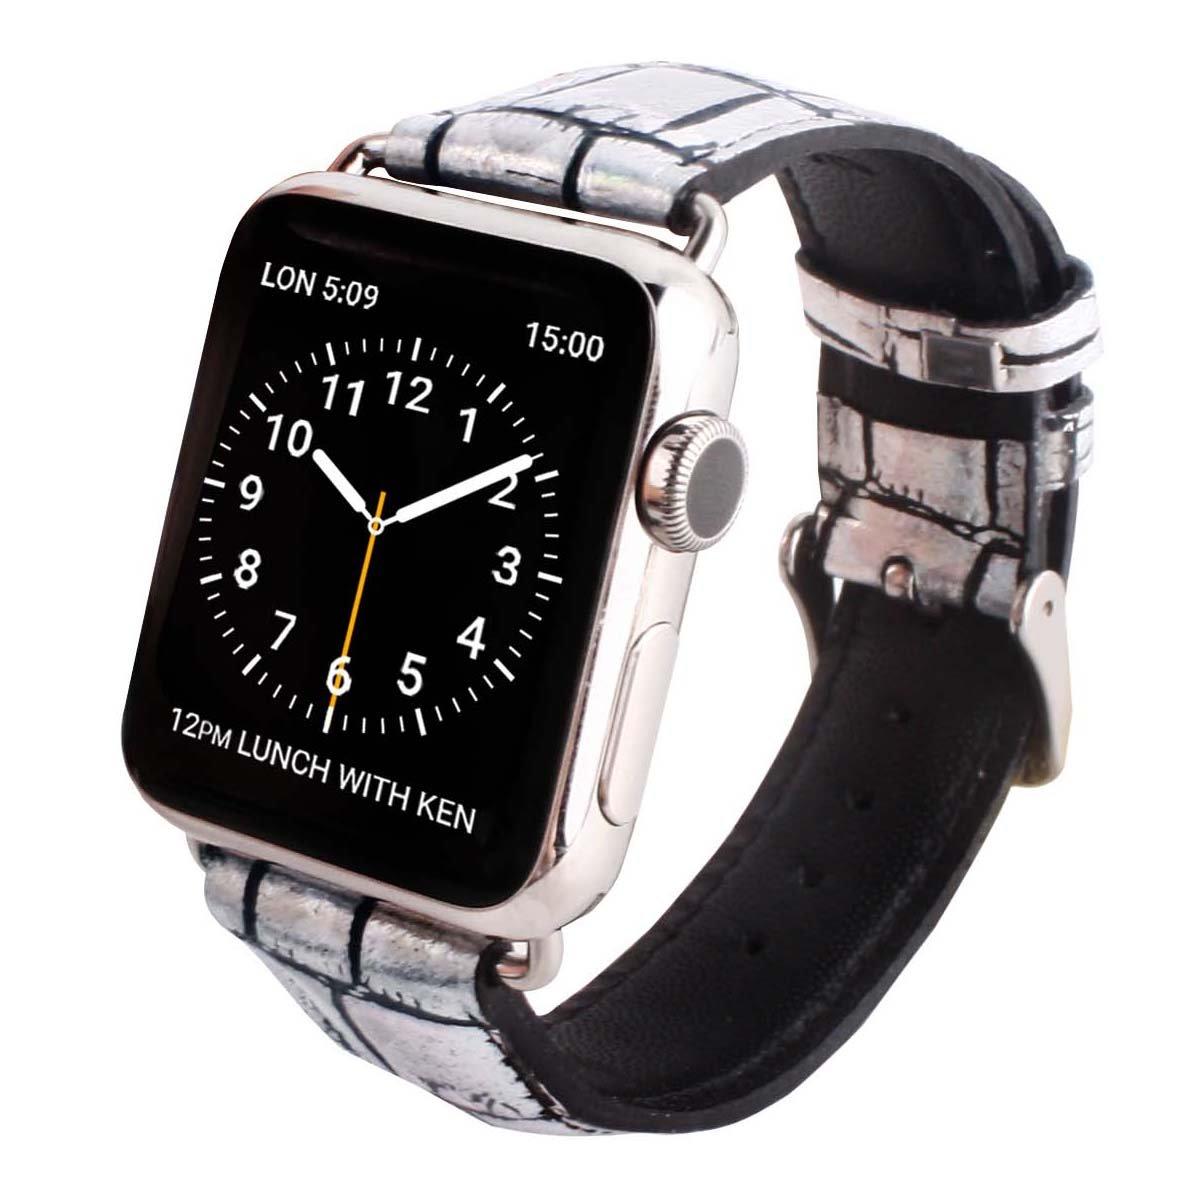 GAZE Band Hologram Croco for Apple Watch 38mm